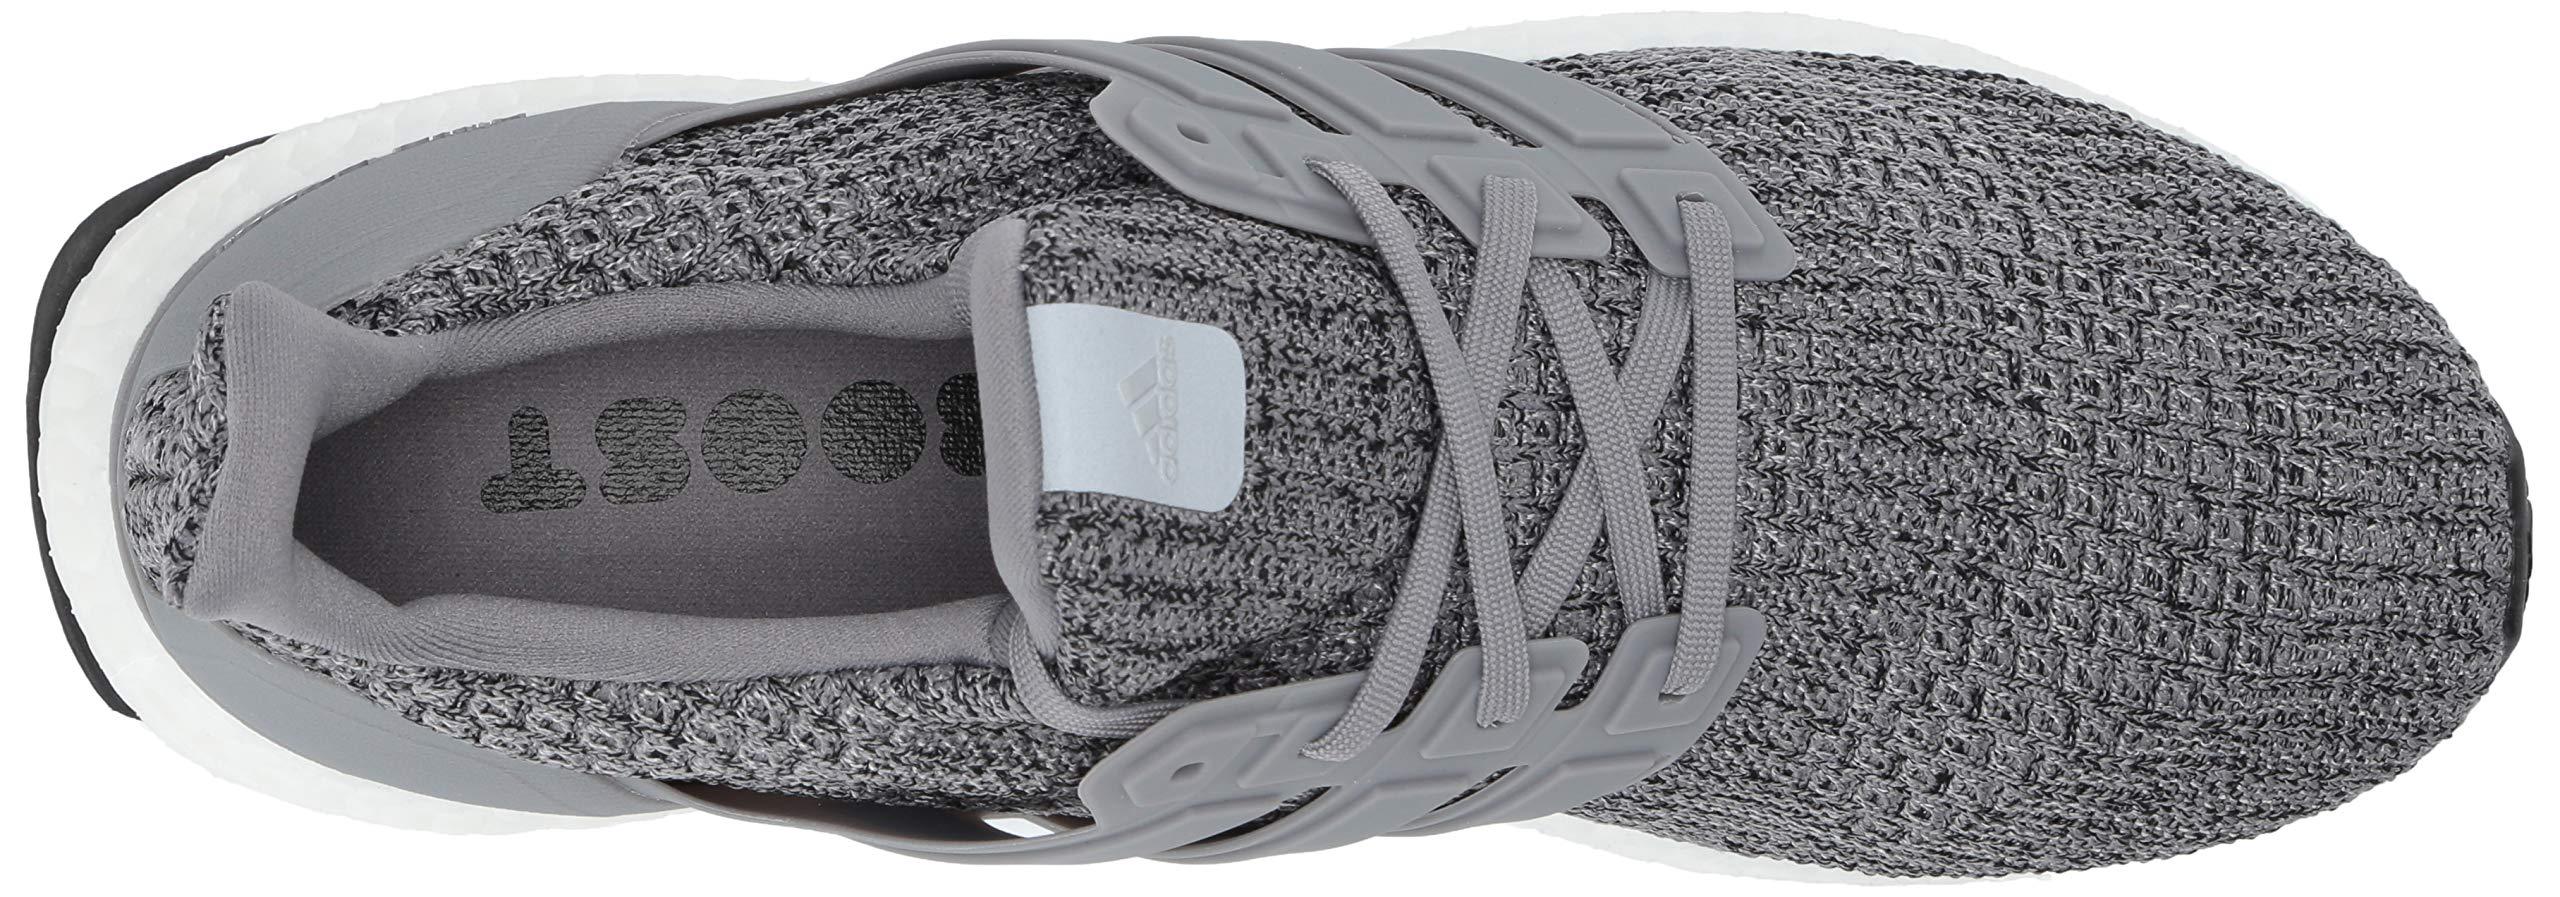 adidas Men's Ultraboost, Grey/Black, 4 M US by adidas (Image #8)